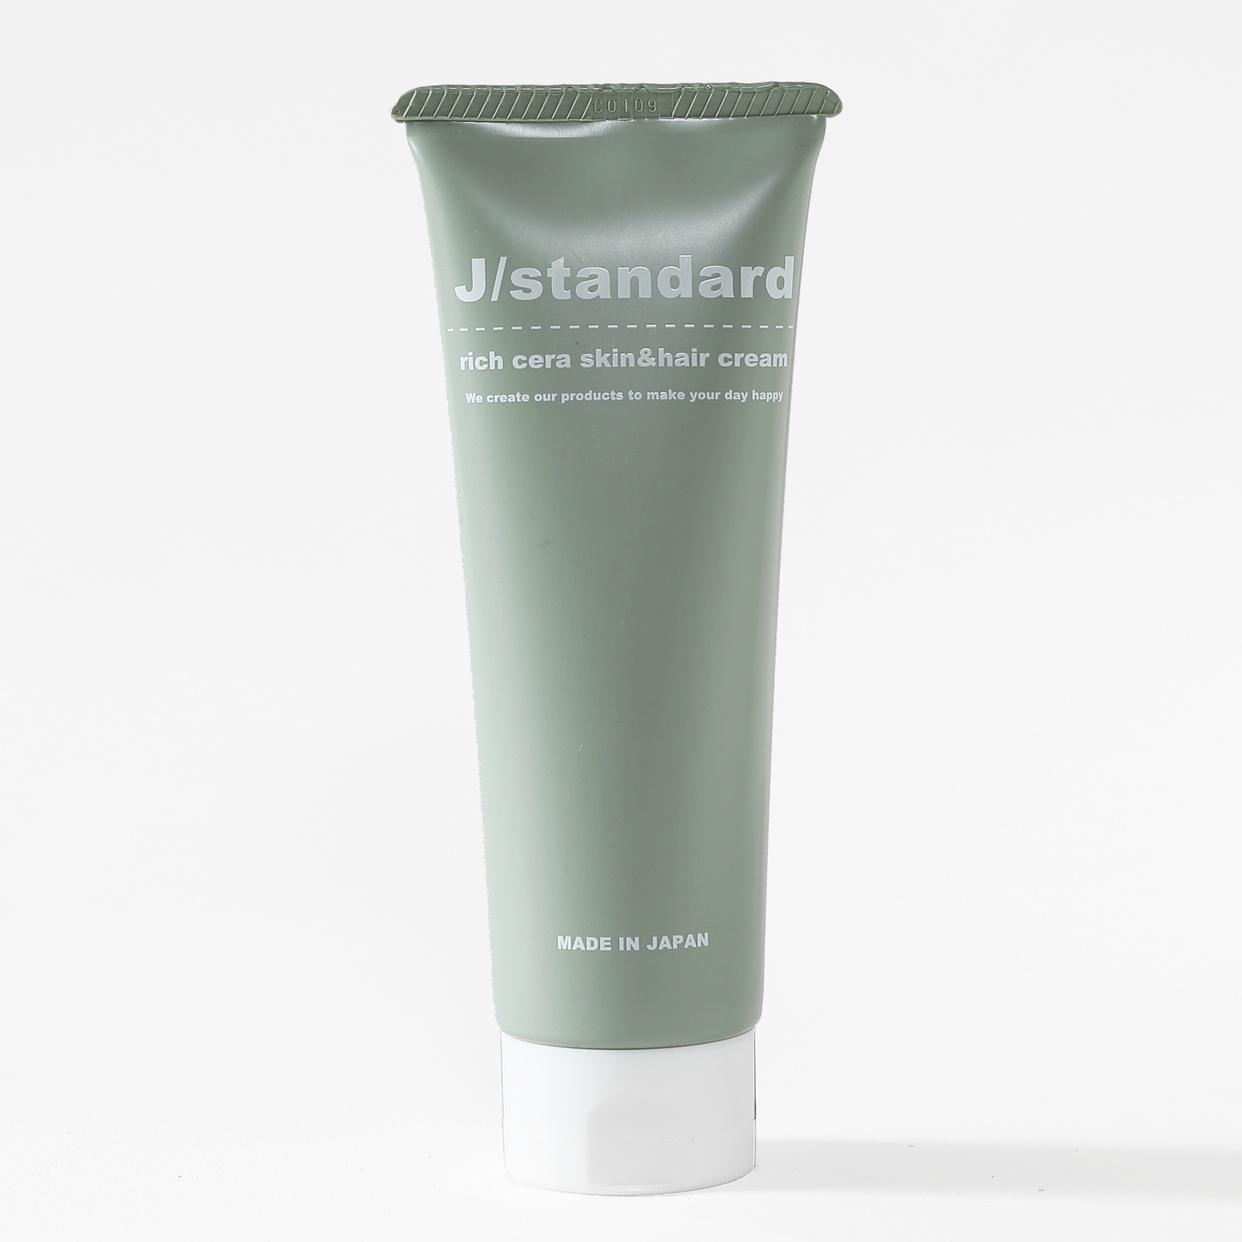 J/standard(ジェイスタンダード) リッチセラ スキン&ヘアクリーム